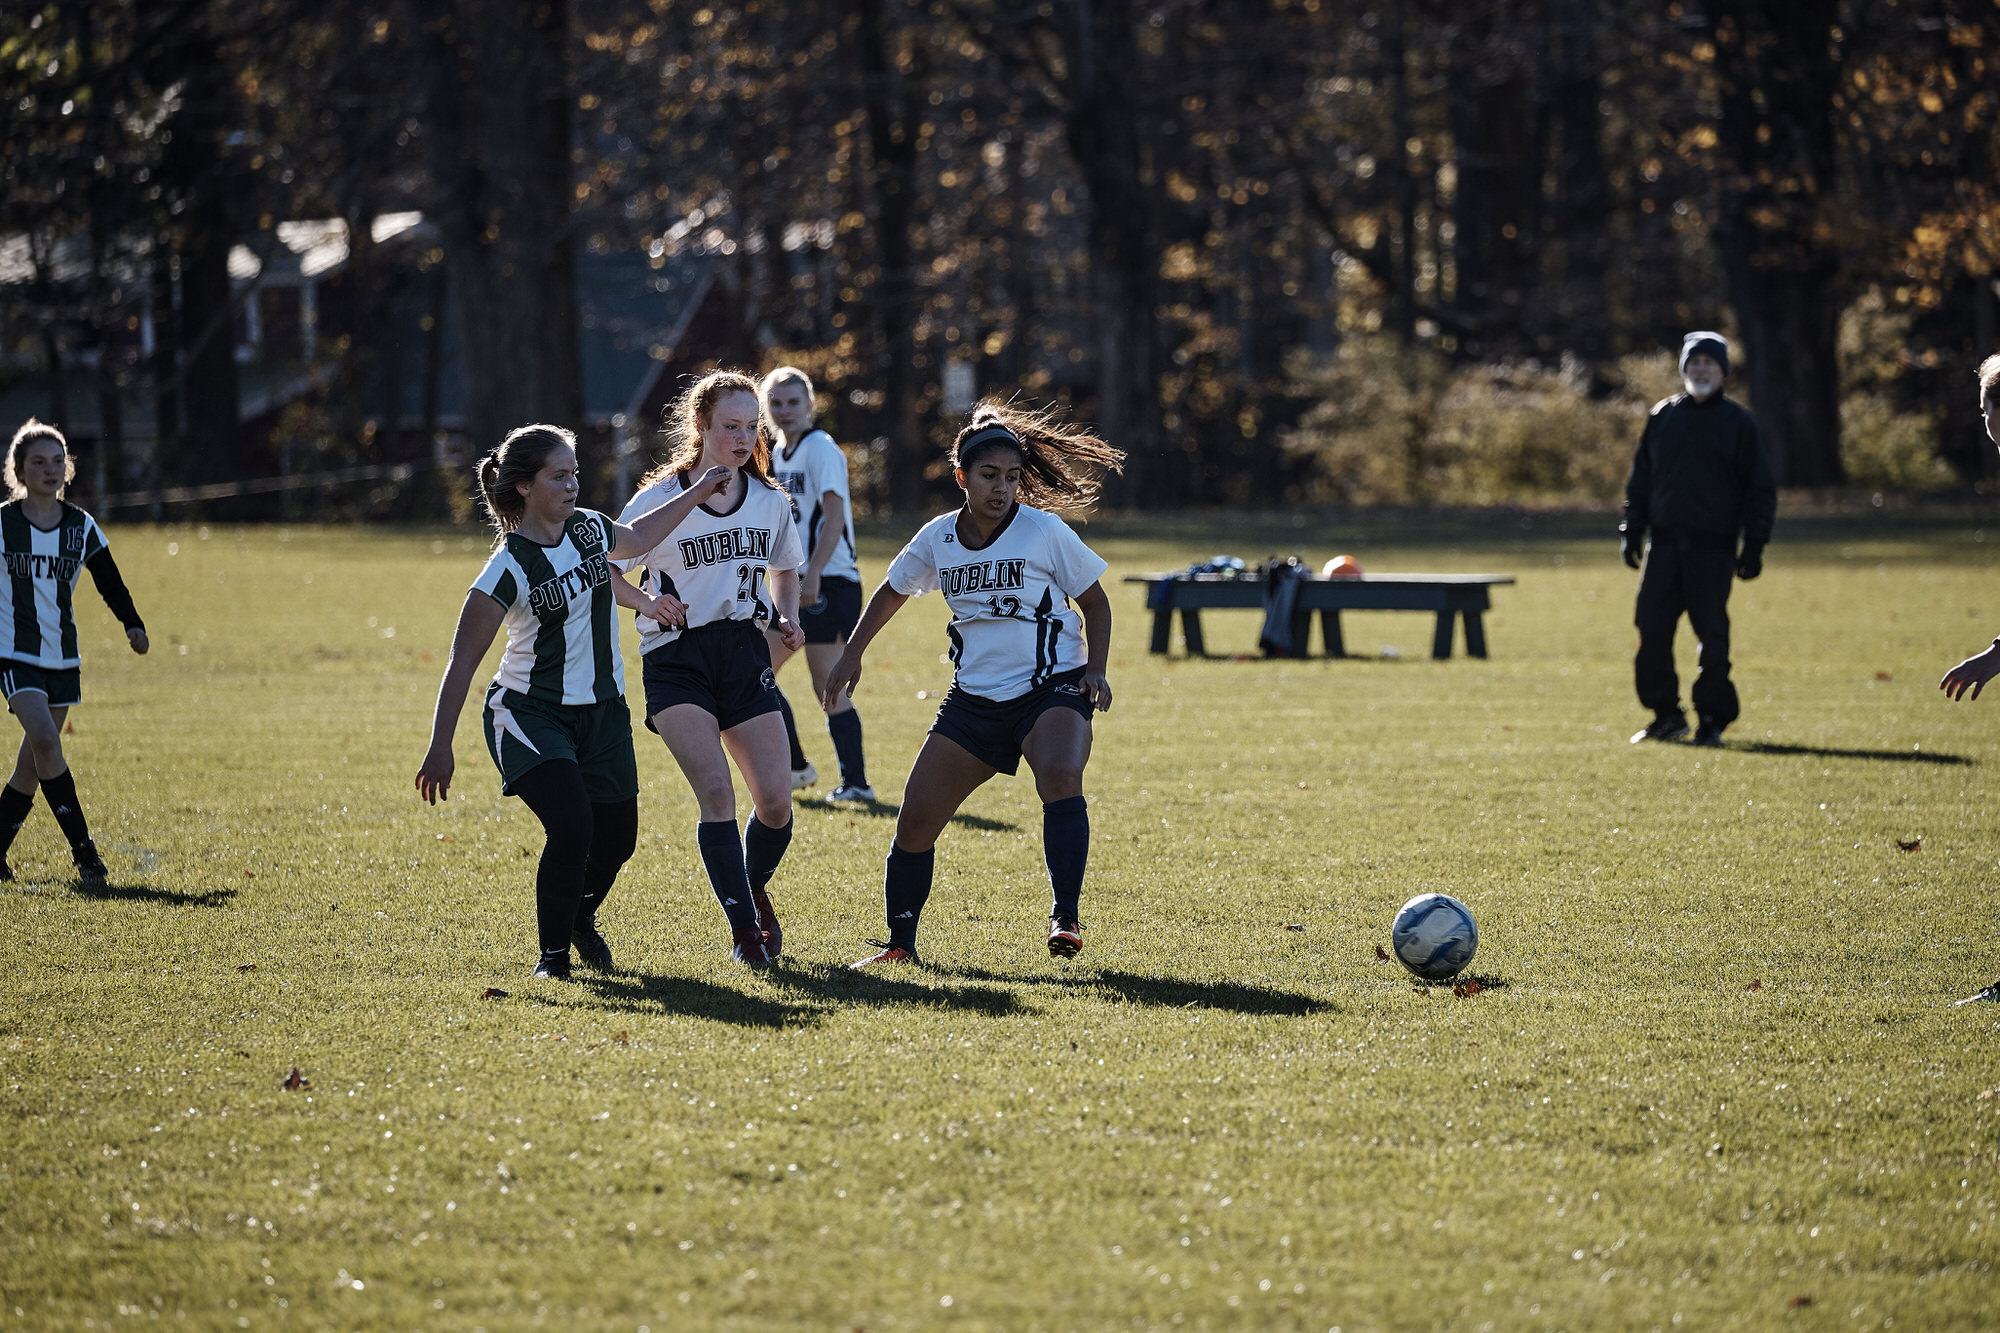 Girls Varsity Soccer vs. Putney School - October 26, 2018 - 016.jpg